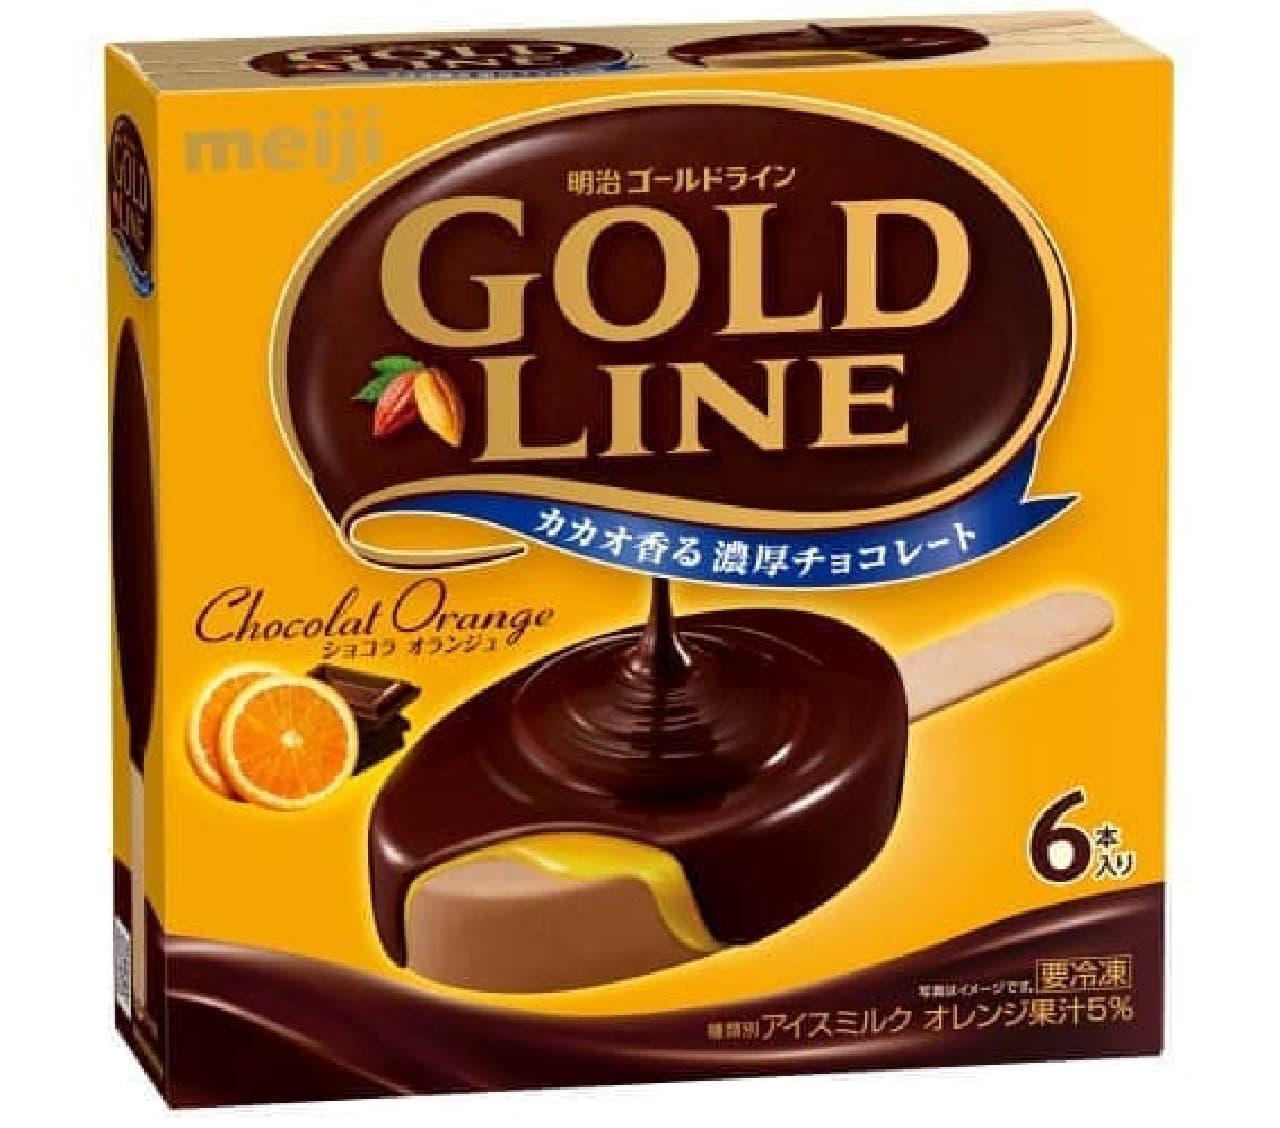 meiji GOLD LINE ショコラ オランジュ